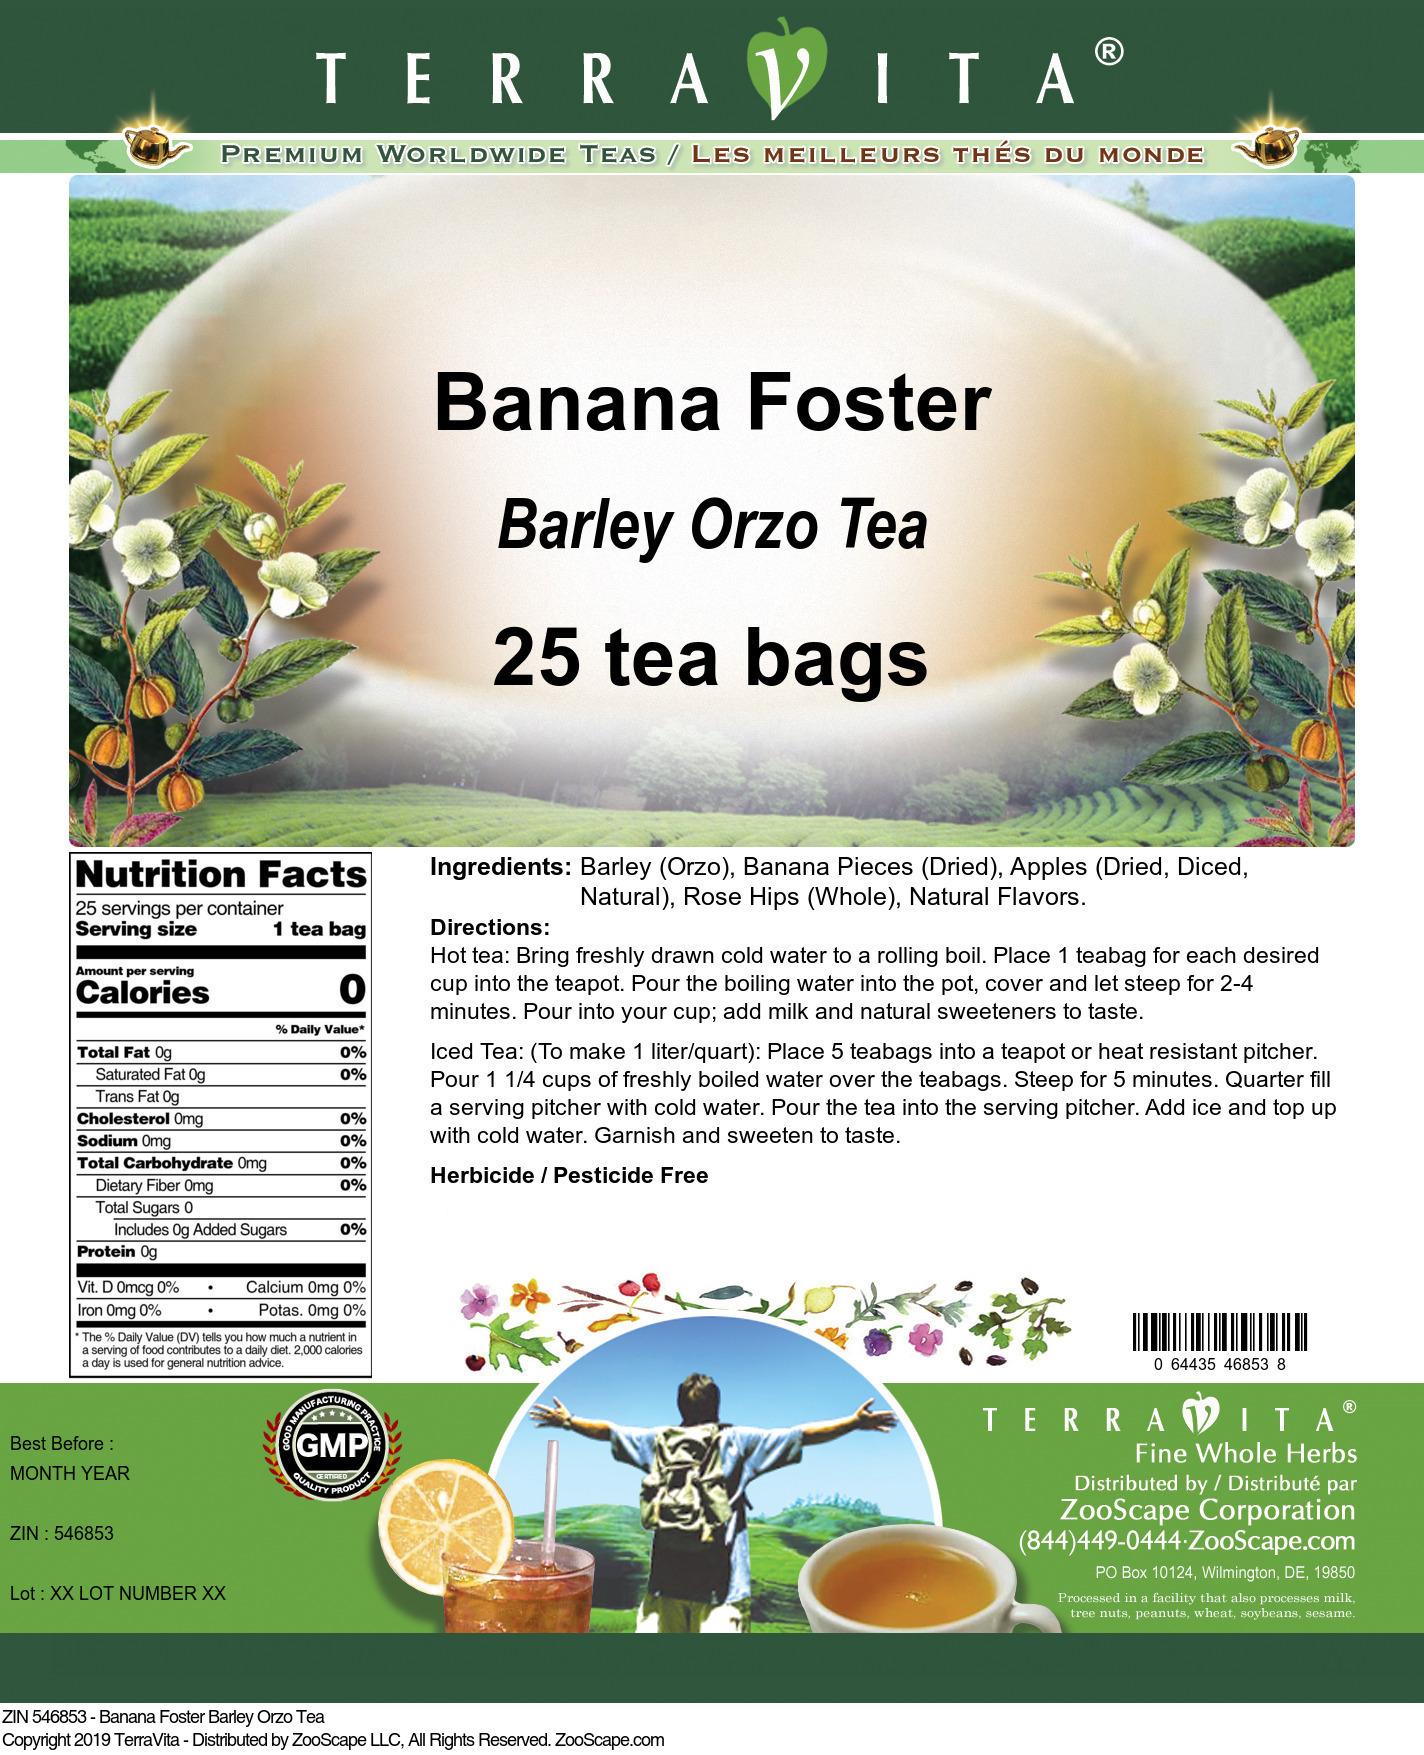 Banana Foster Barley Orzo